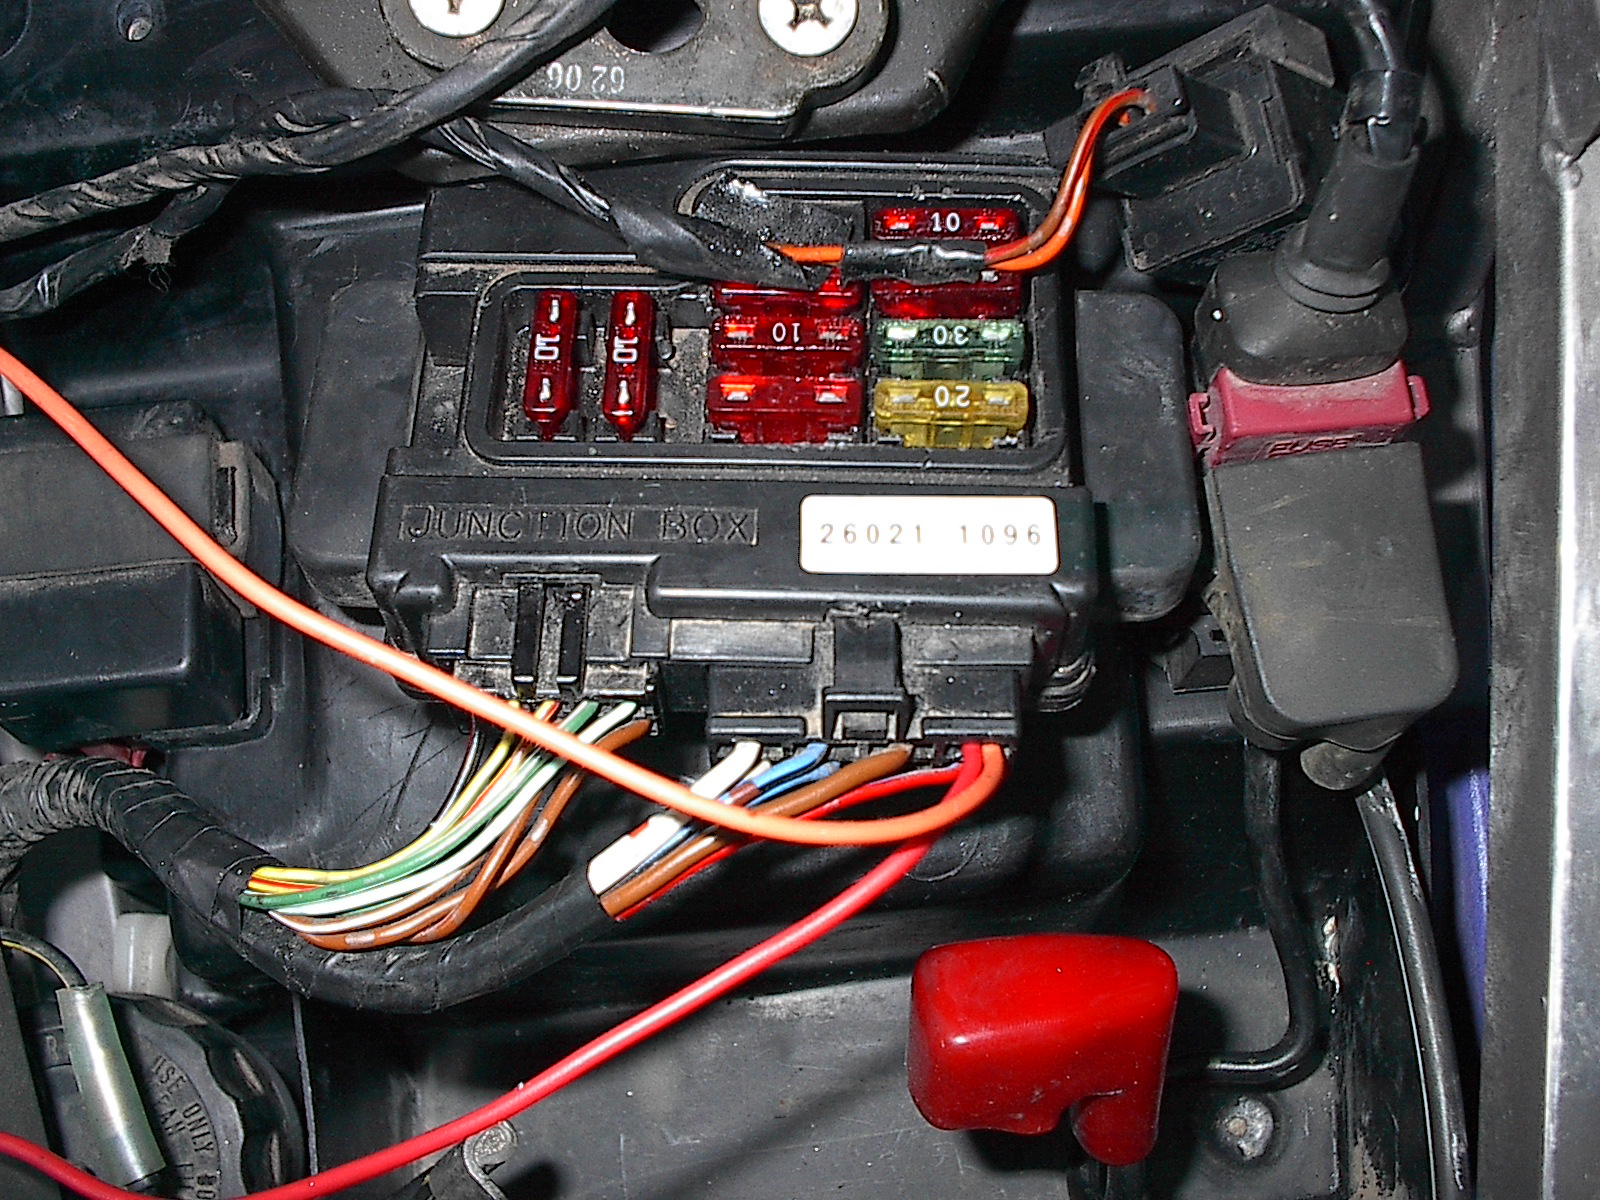 2009 Yamaha R1 Fuse Box | Wiring Schematic Diagram - 29 ... on